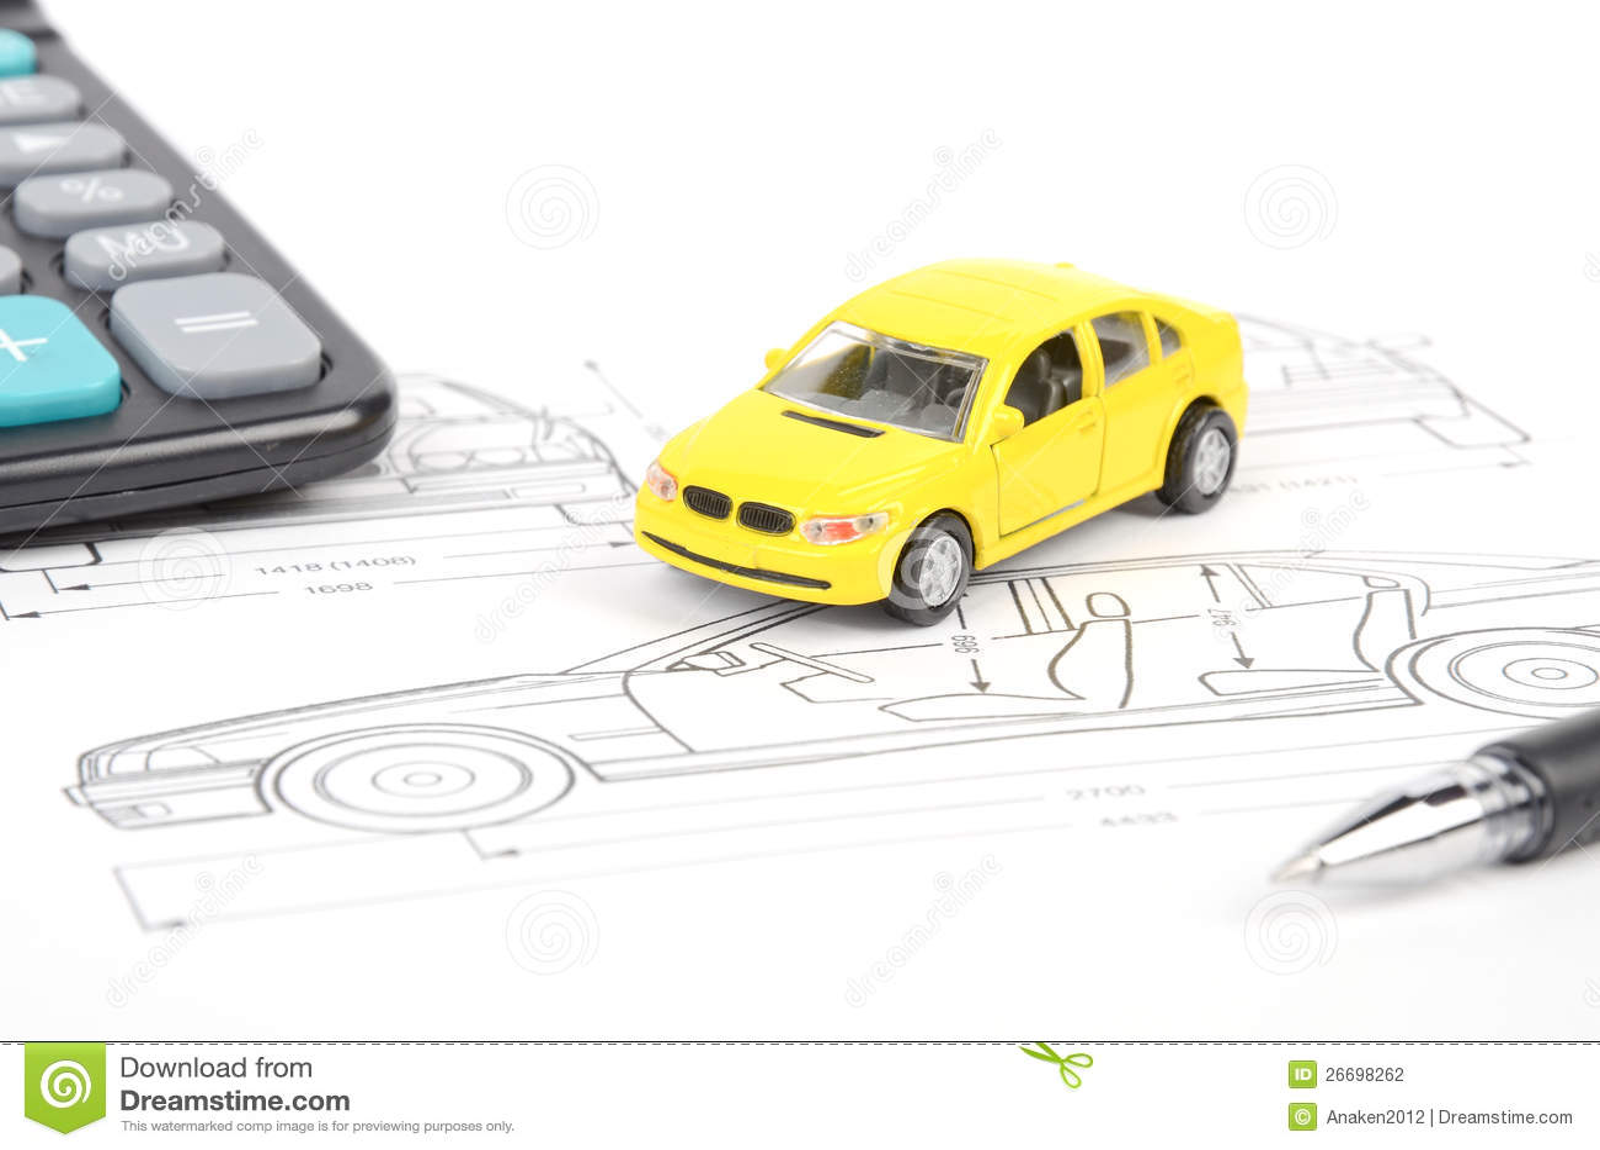 Car blueprint stock photo. Image of keyboard, fraph, model - 26698262